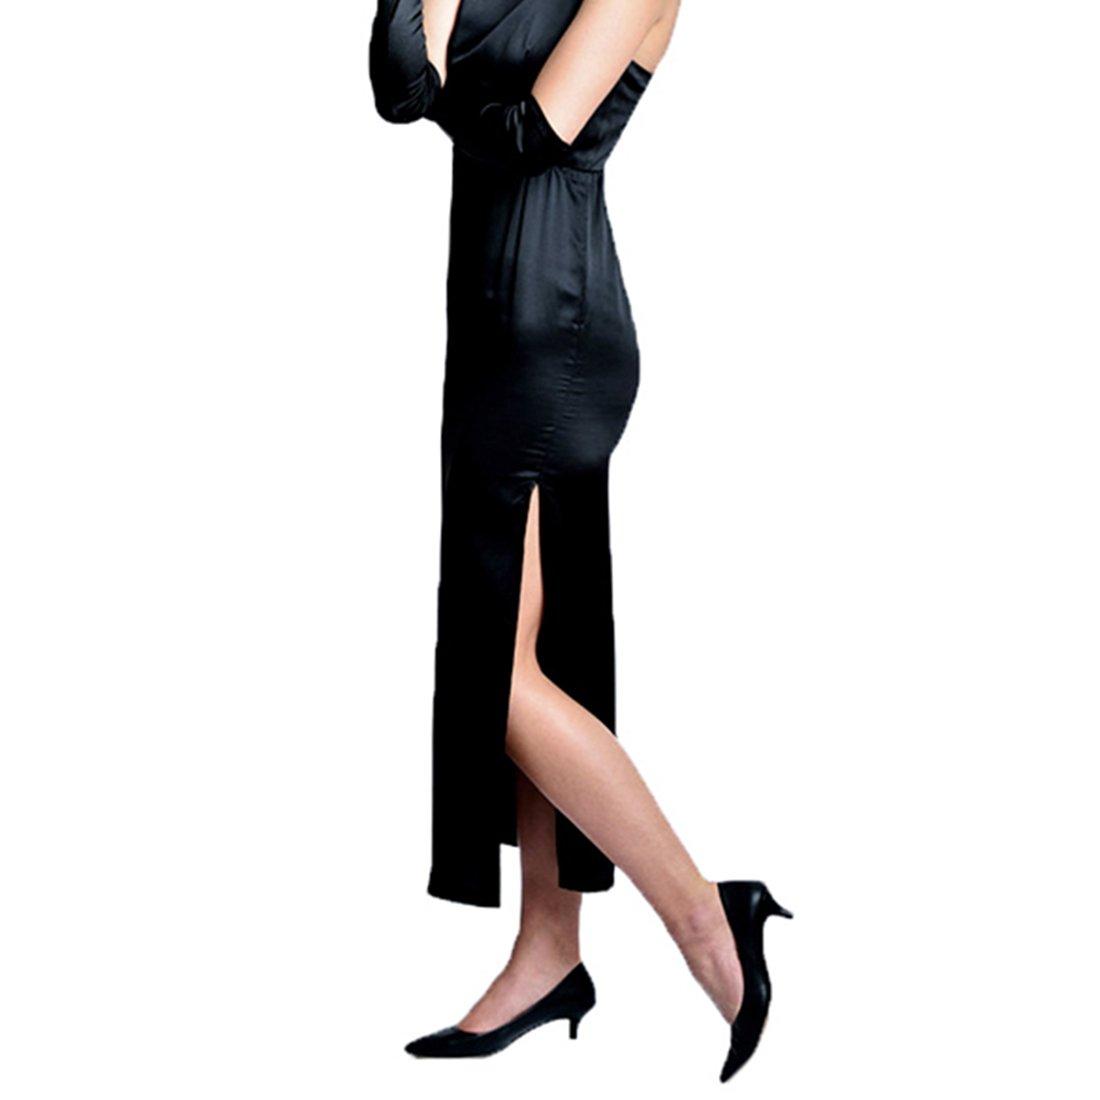 Audrey Hepburn ''Breakfast at Tiffany's'' Complete Costume Set - Satin Version (S) w/Gift Box by Utopiat (Image #4)